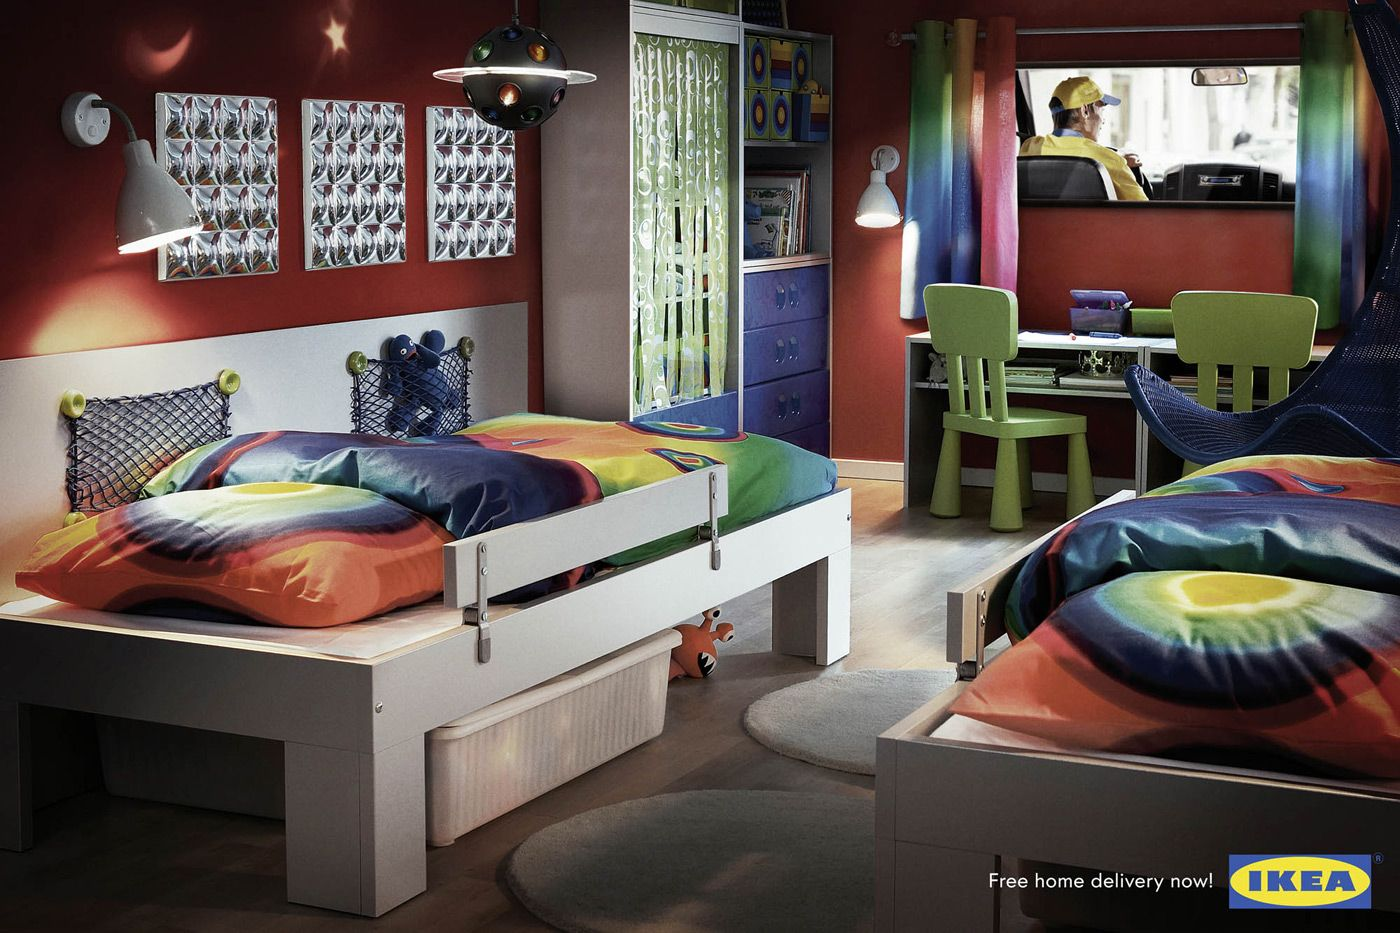 cool idea for illusion mural love the bedside storage idea ikea shared kids room